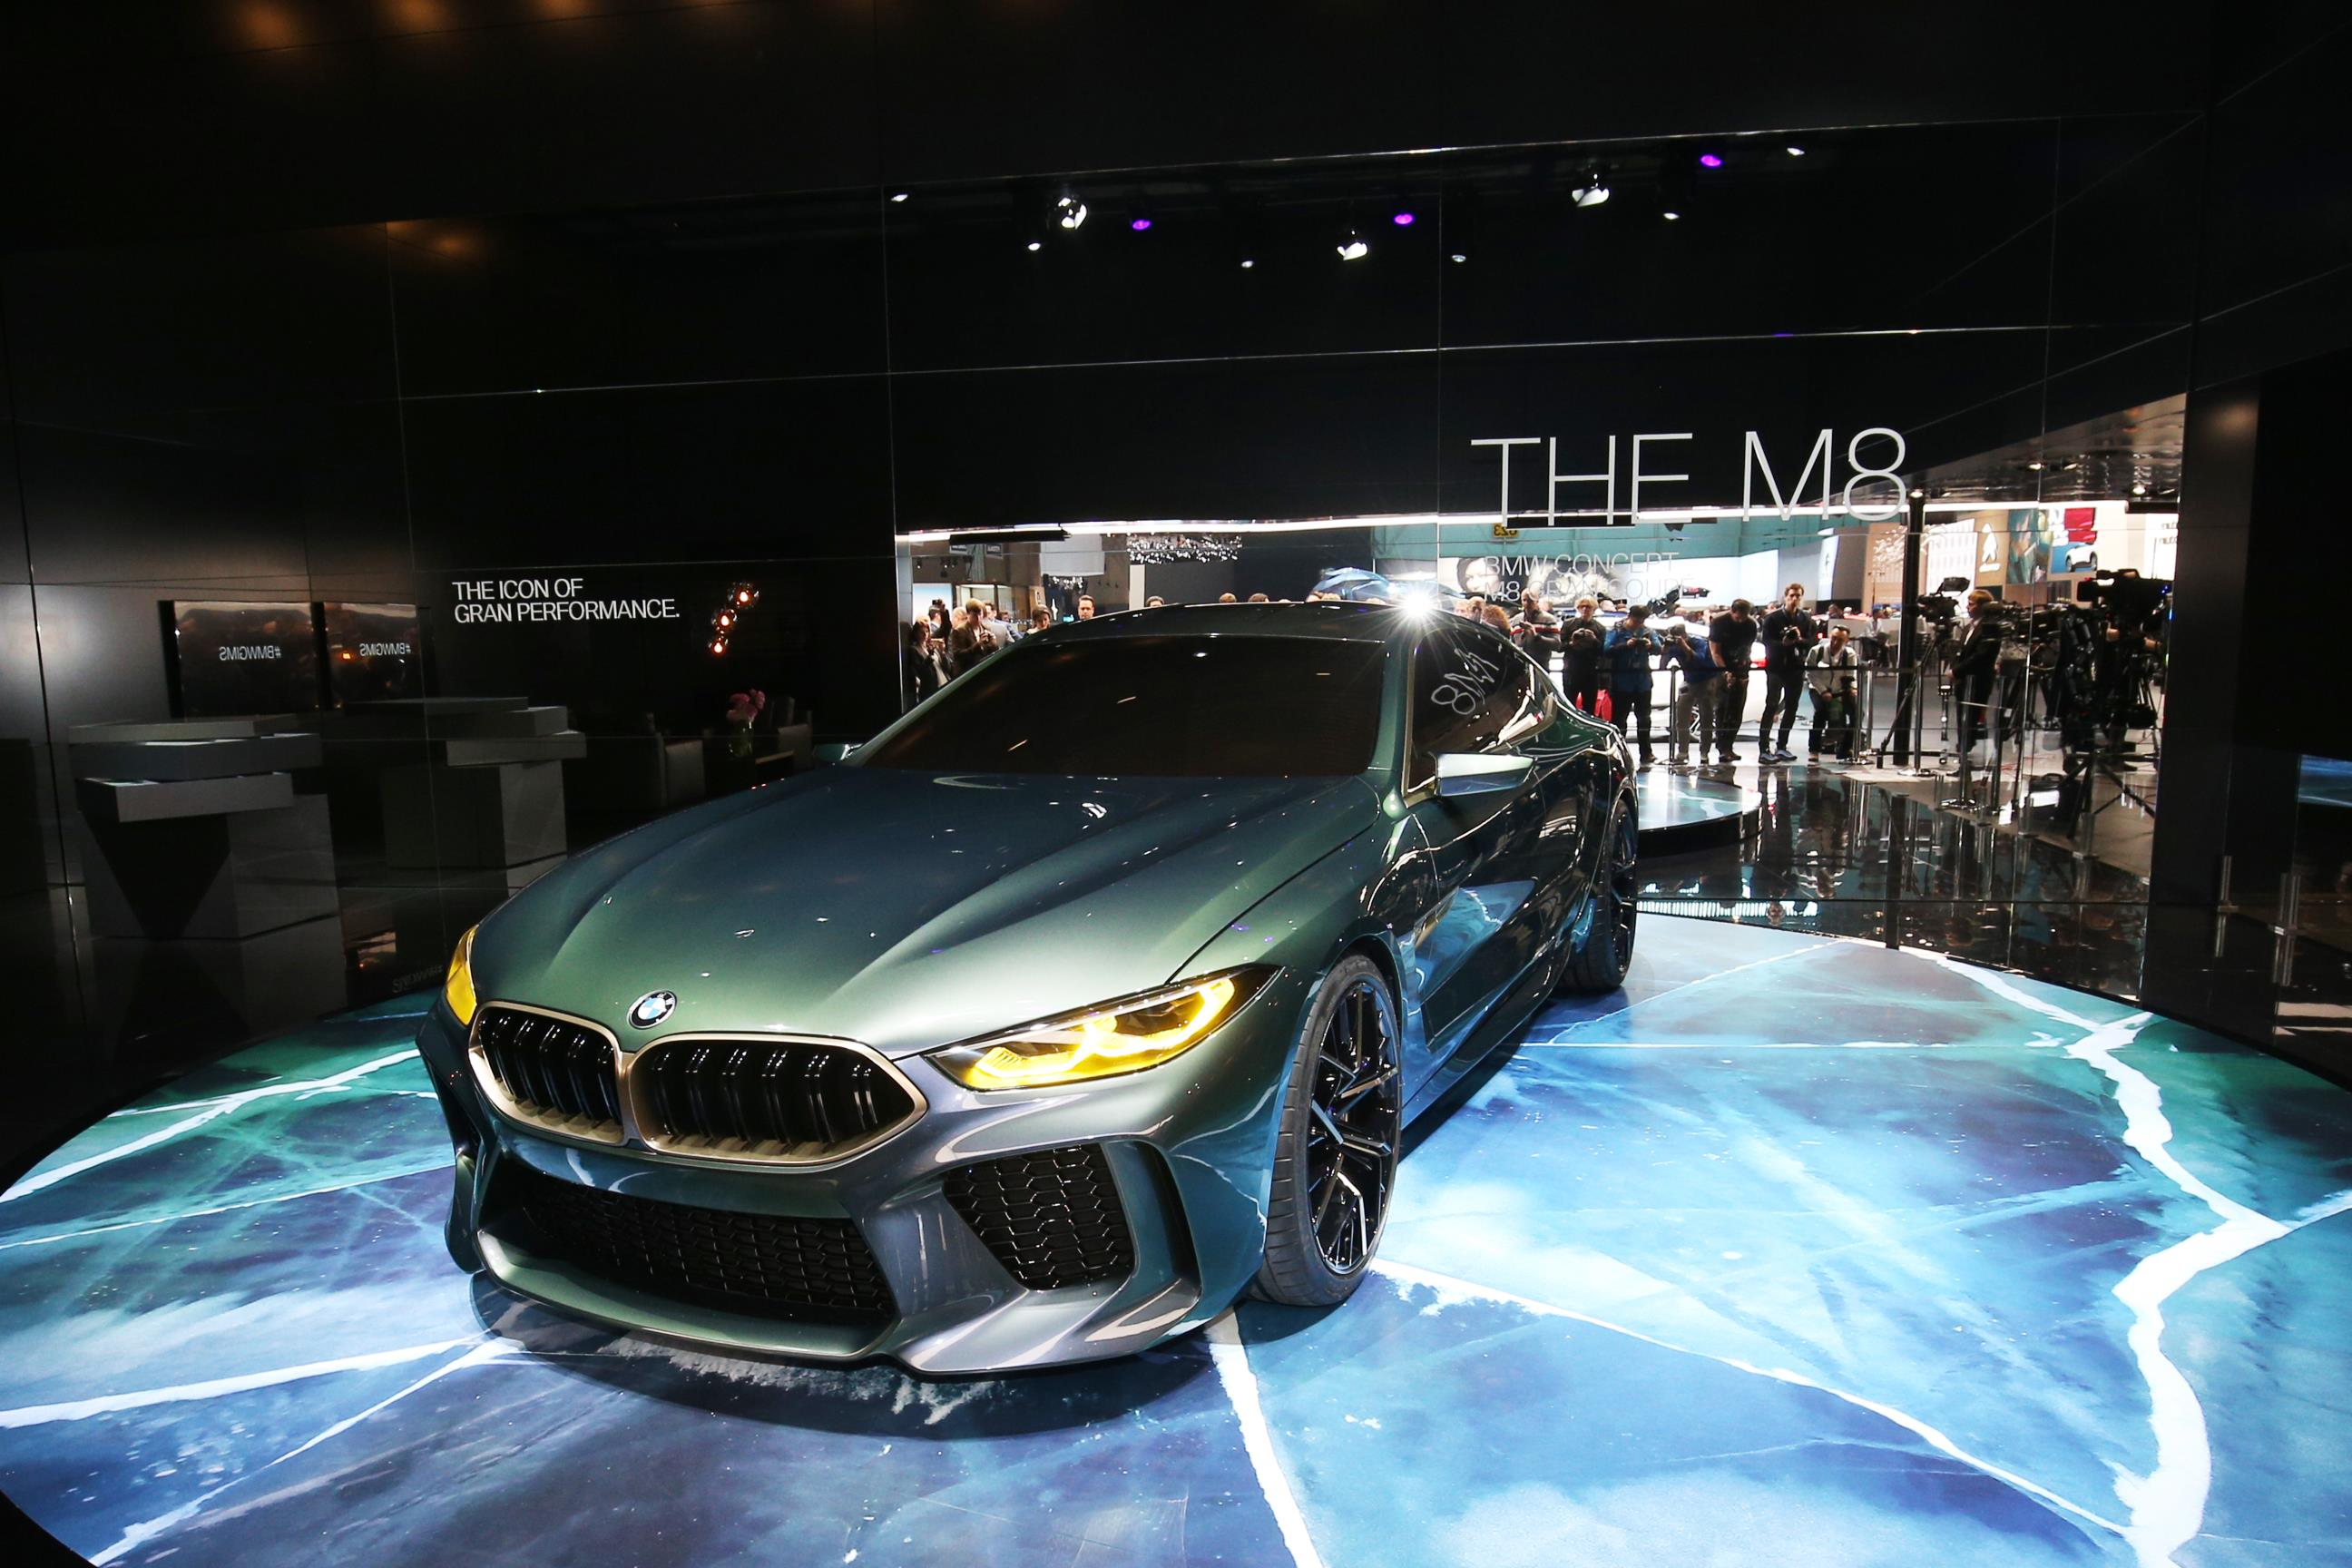 Geneva Motor Show 2018 Mega Gallery Part 1 (1)